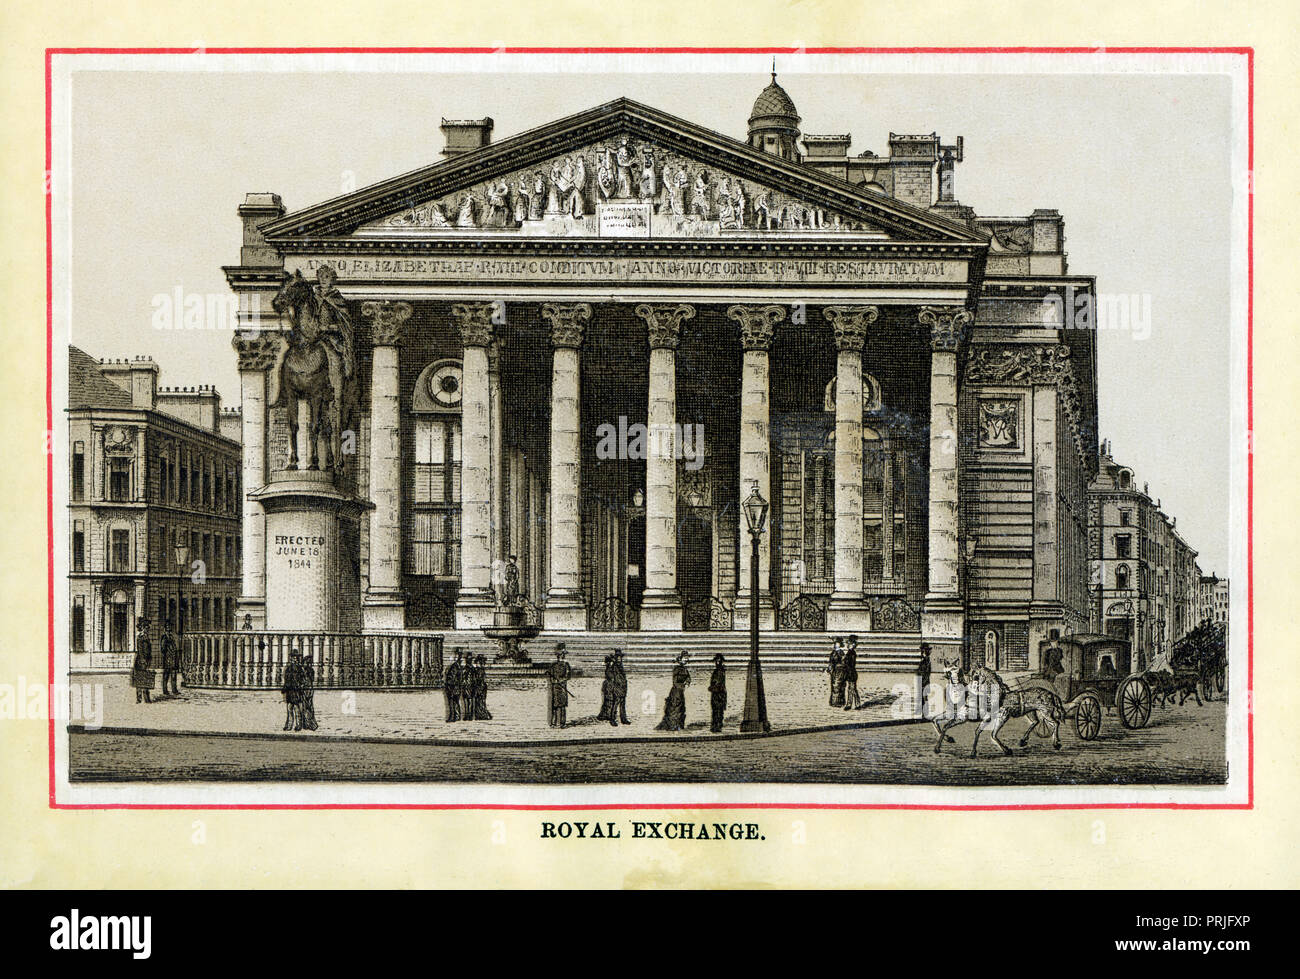 1844 Engraving Stock Photos & 1844 Engraving Stock Images